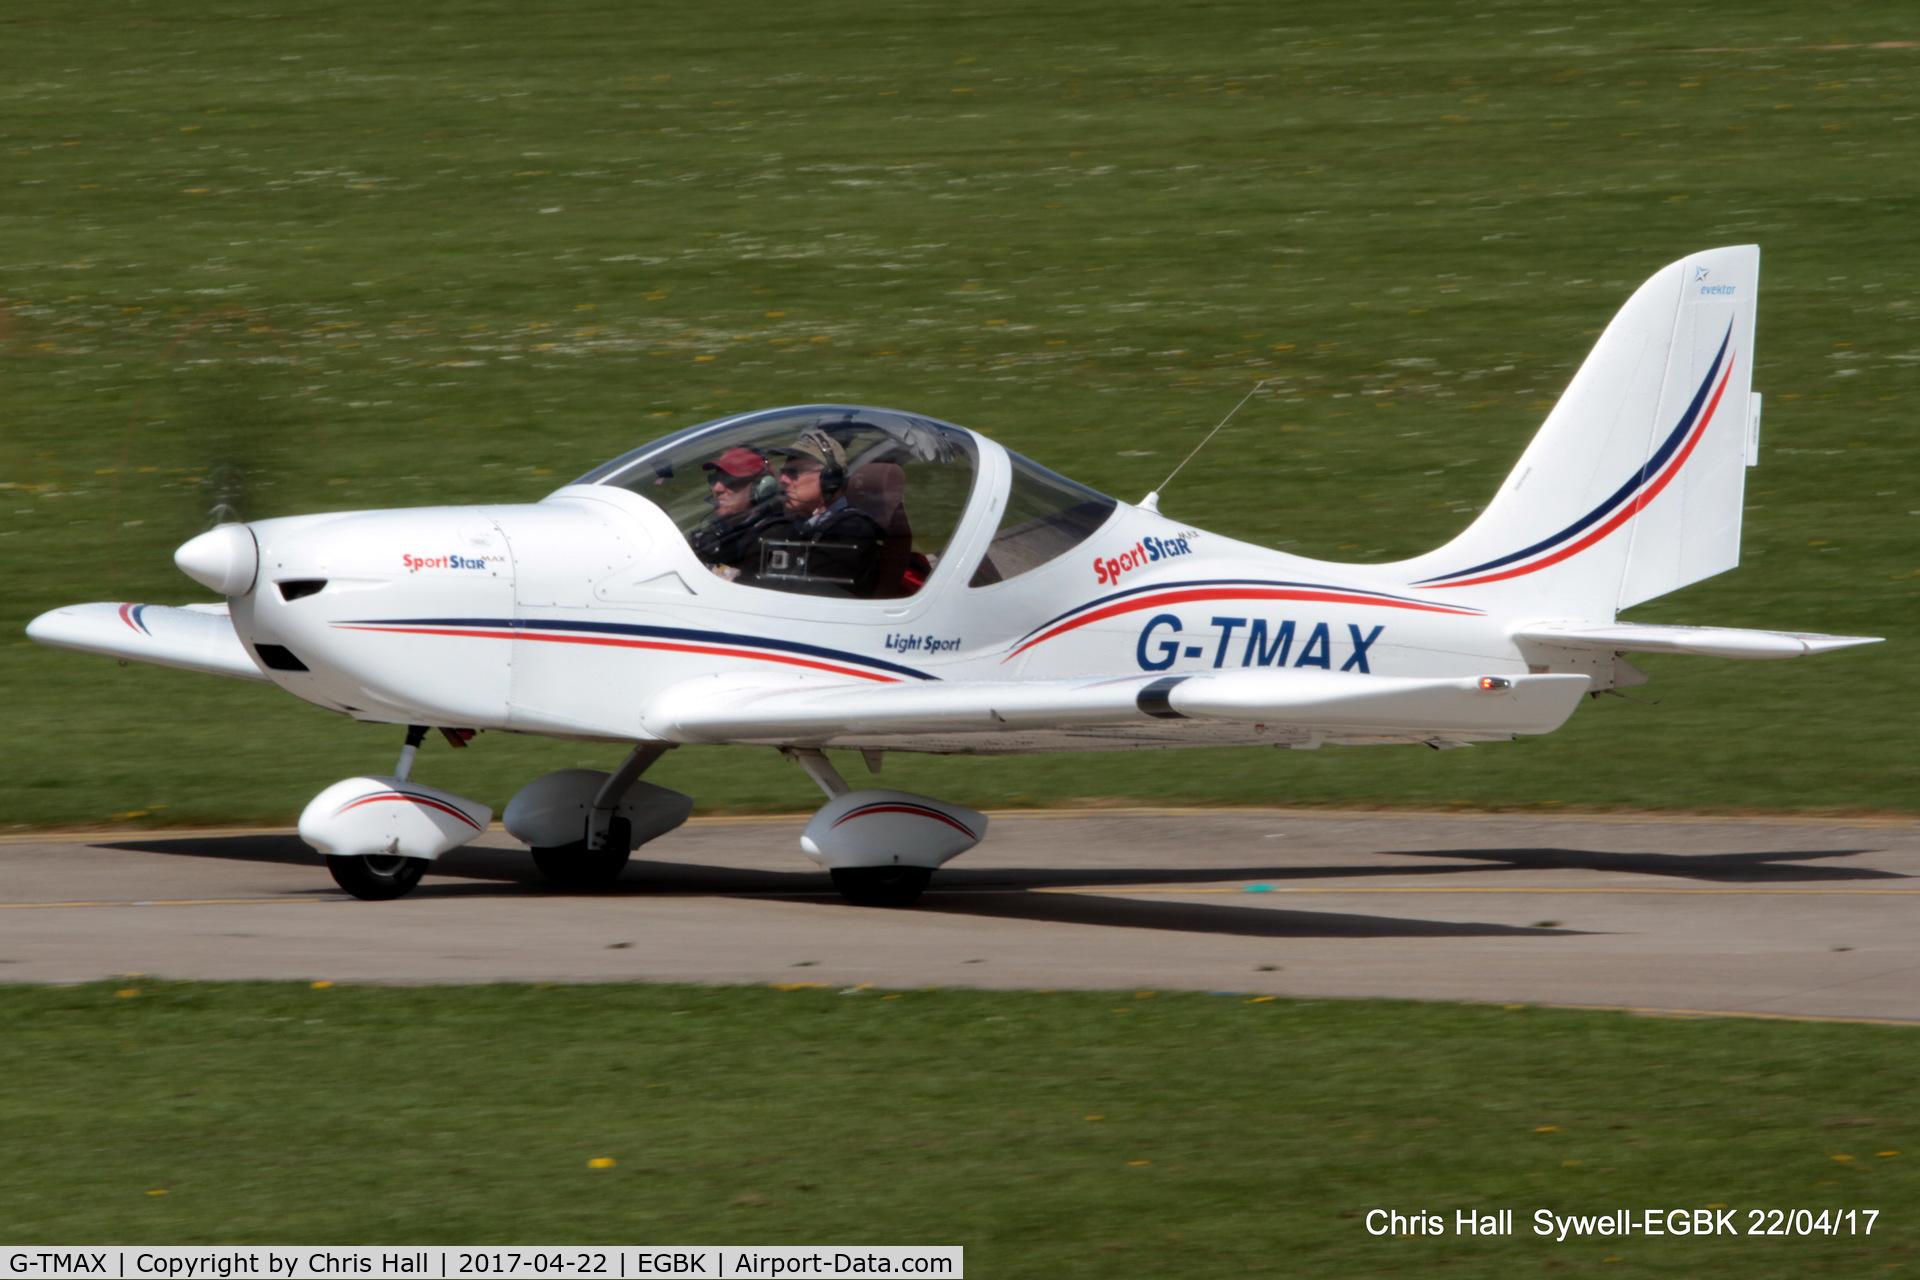 G-TMAX, 2010 Evektor-Aerotechnik Sportstar Max C/N 2010-1305, at the EV-97 fly in. Sywell